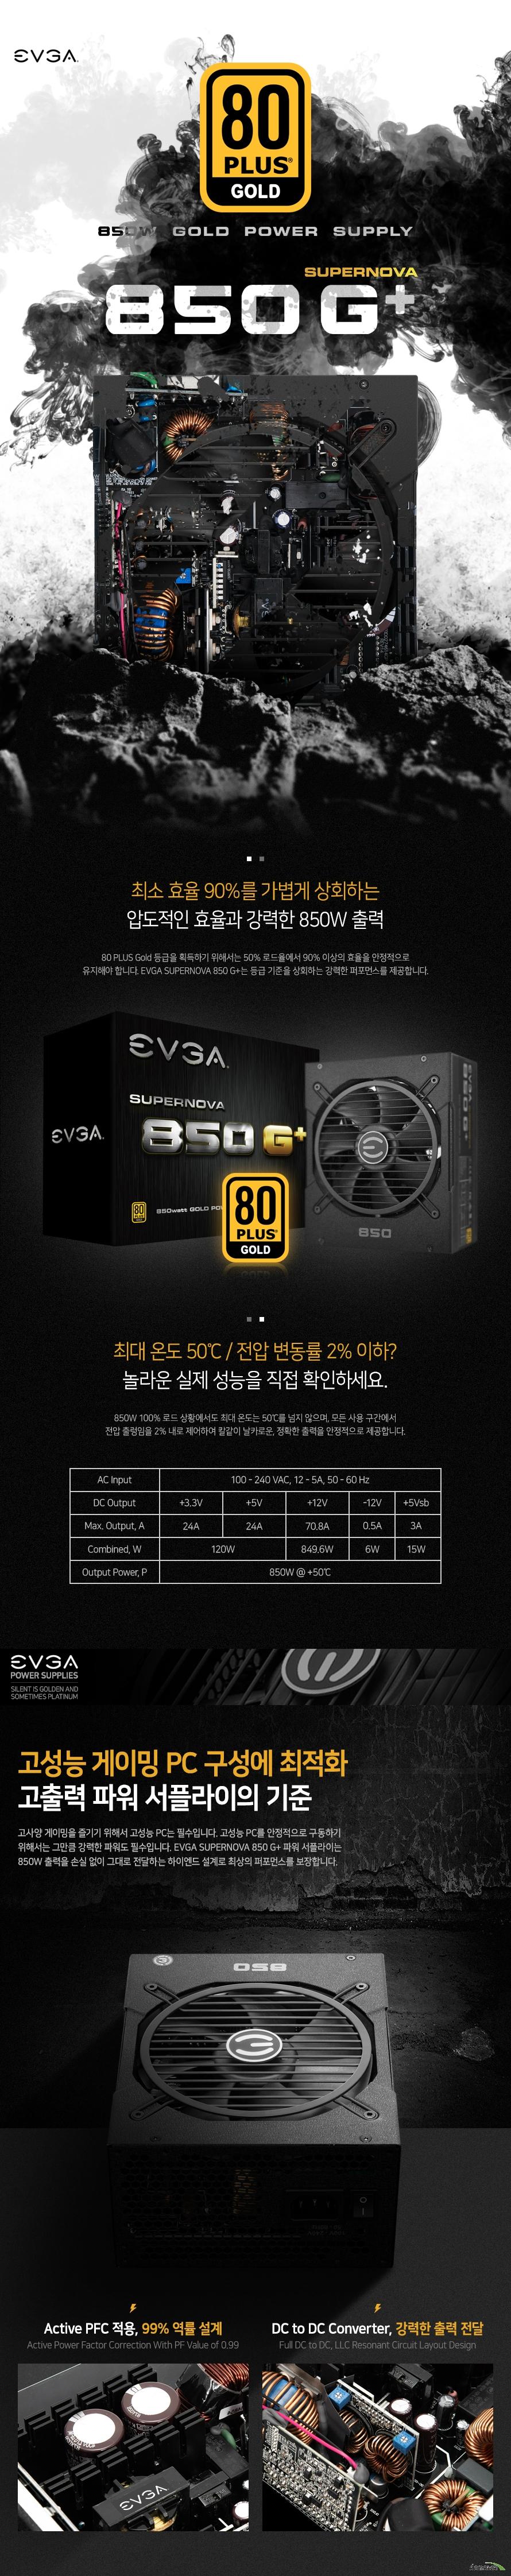 EVGA SUPERNOVA 850G+ 80PLUS GOLD